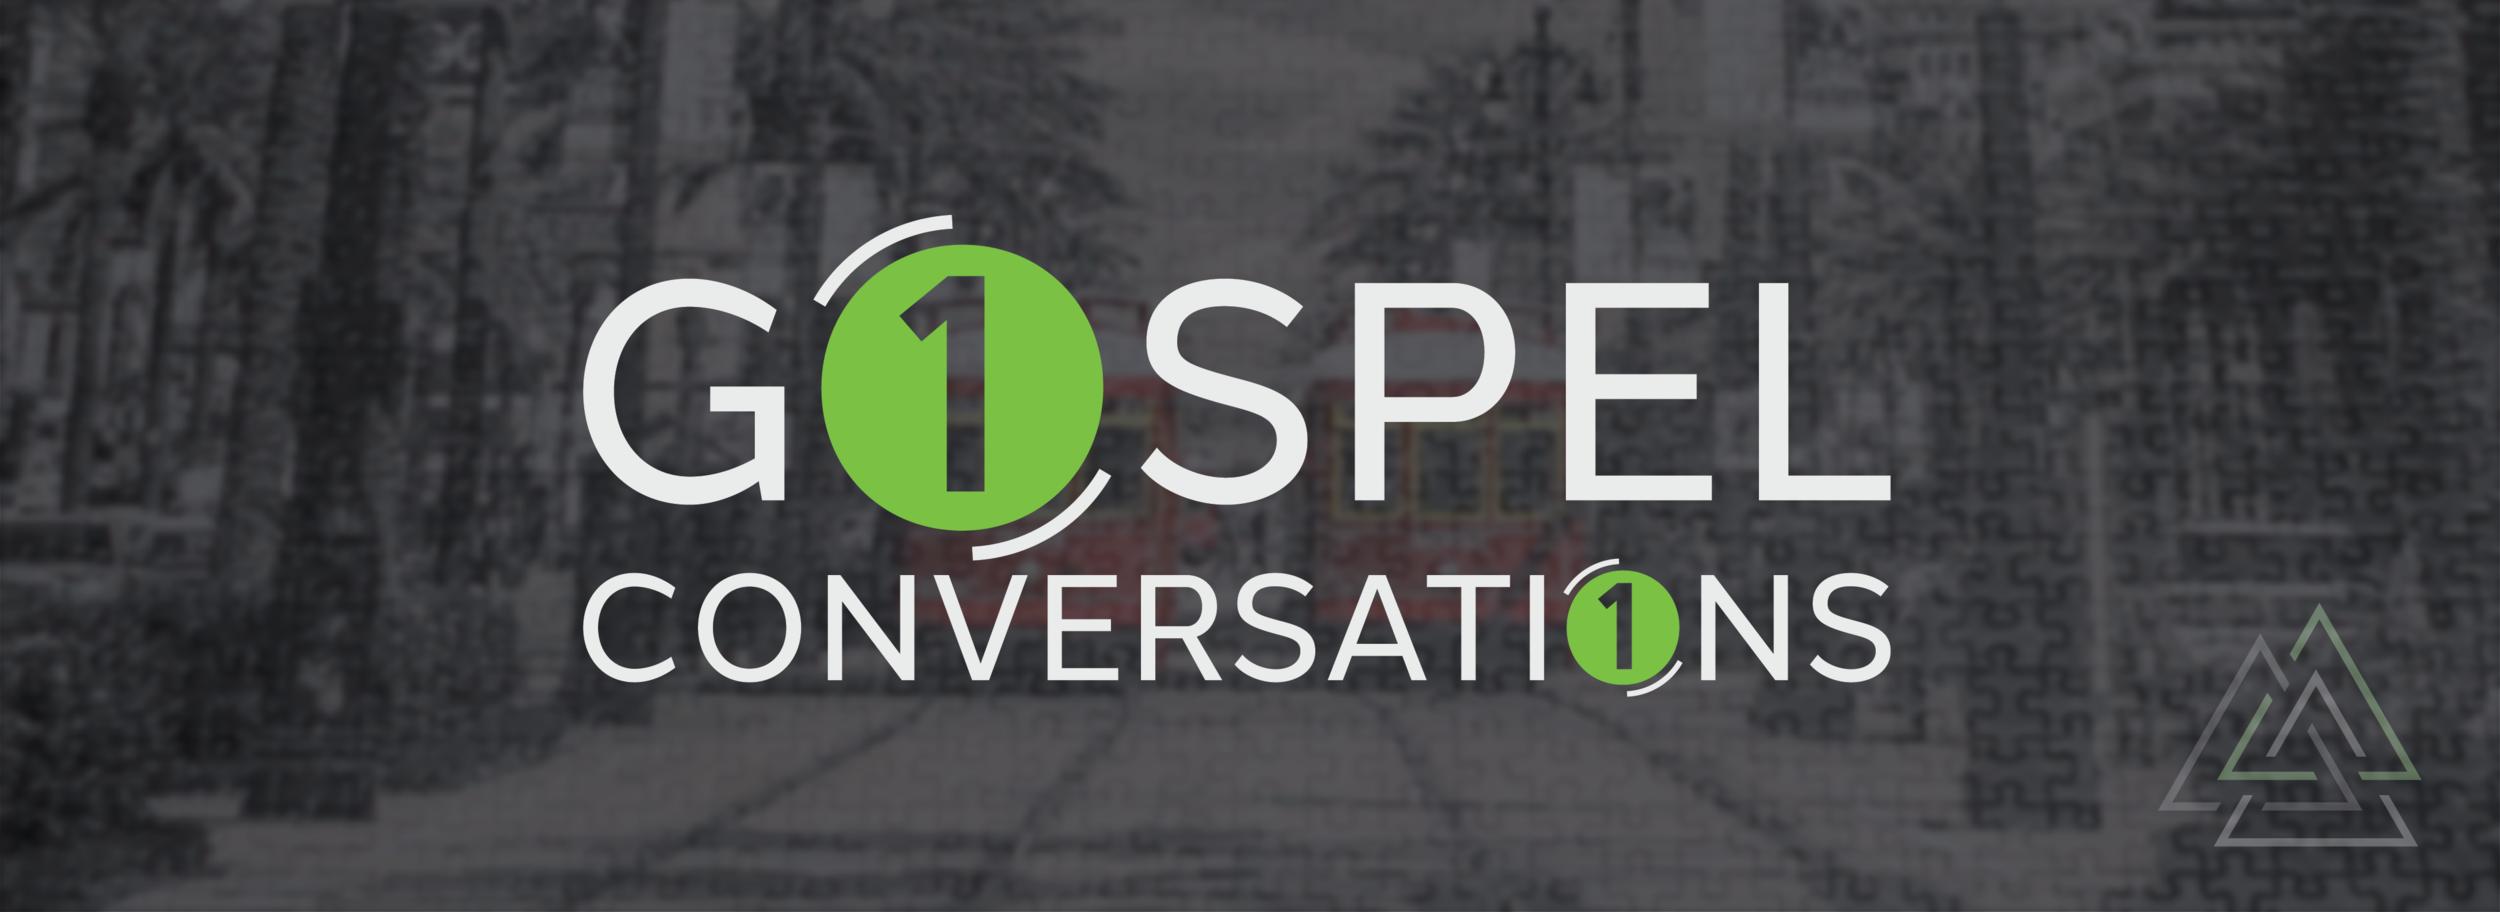 Gospel Conversations July 2019 Romans